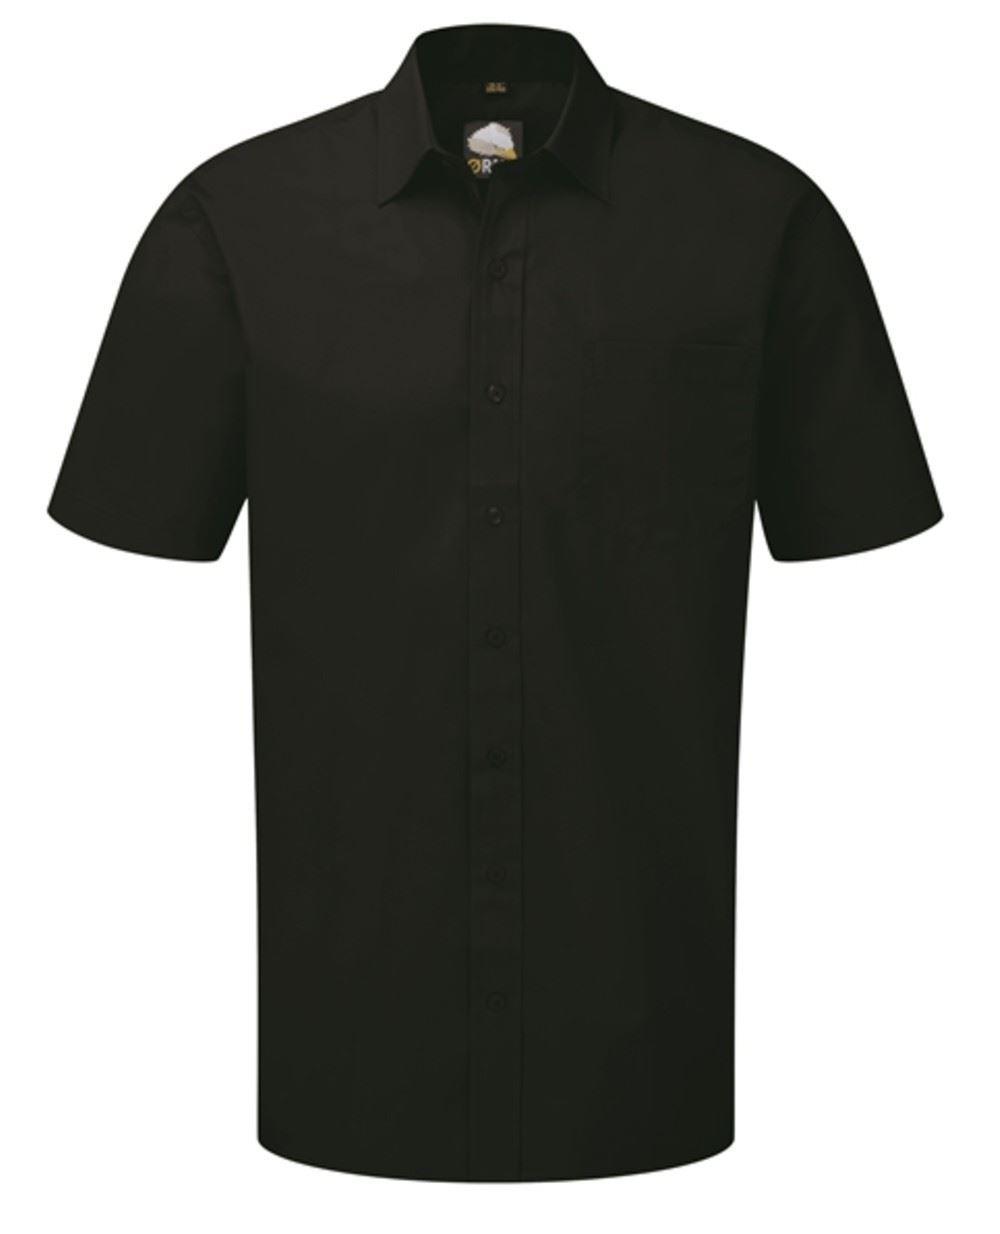 Orn Manchester Short Sleeve Shirt - Black|21